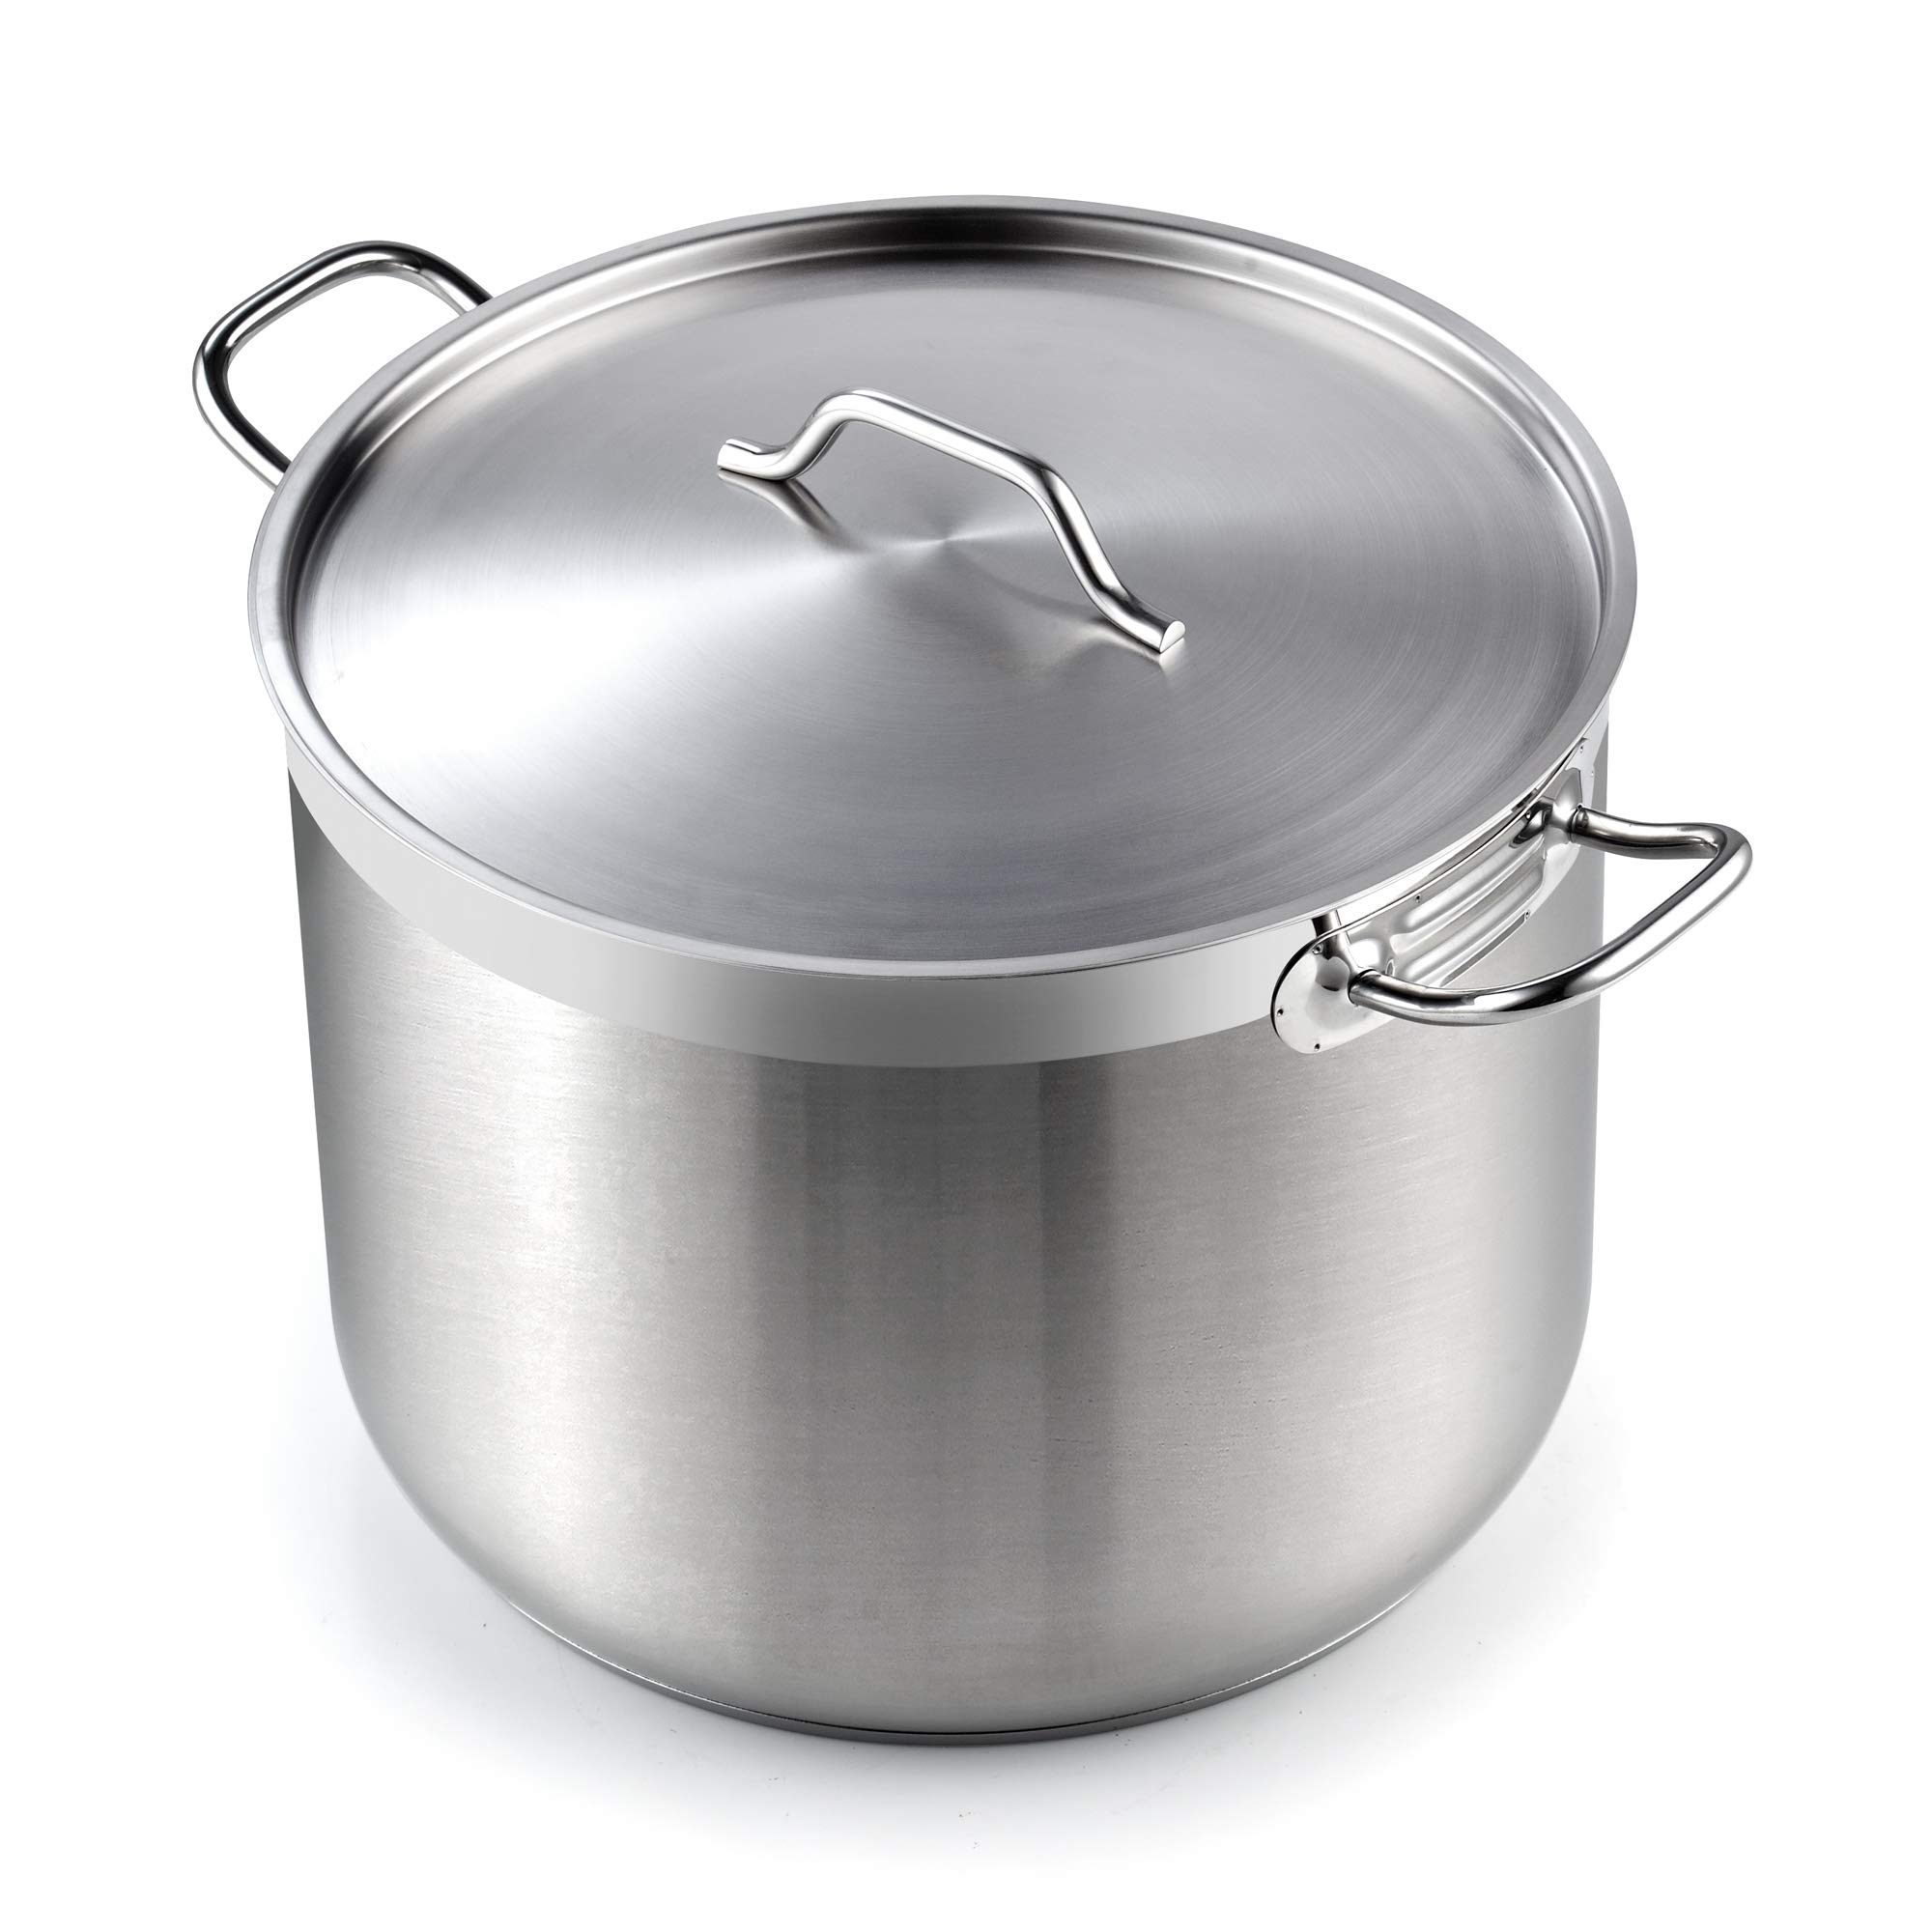 Cooks Standard 02616 Professional Grade Lid 30 Quart Stainless Steel Stockpot, Silver